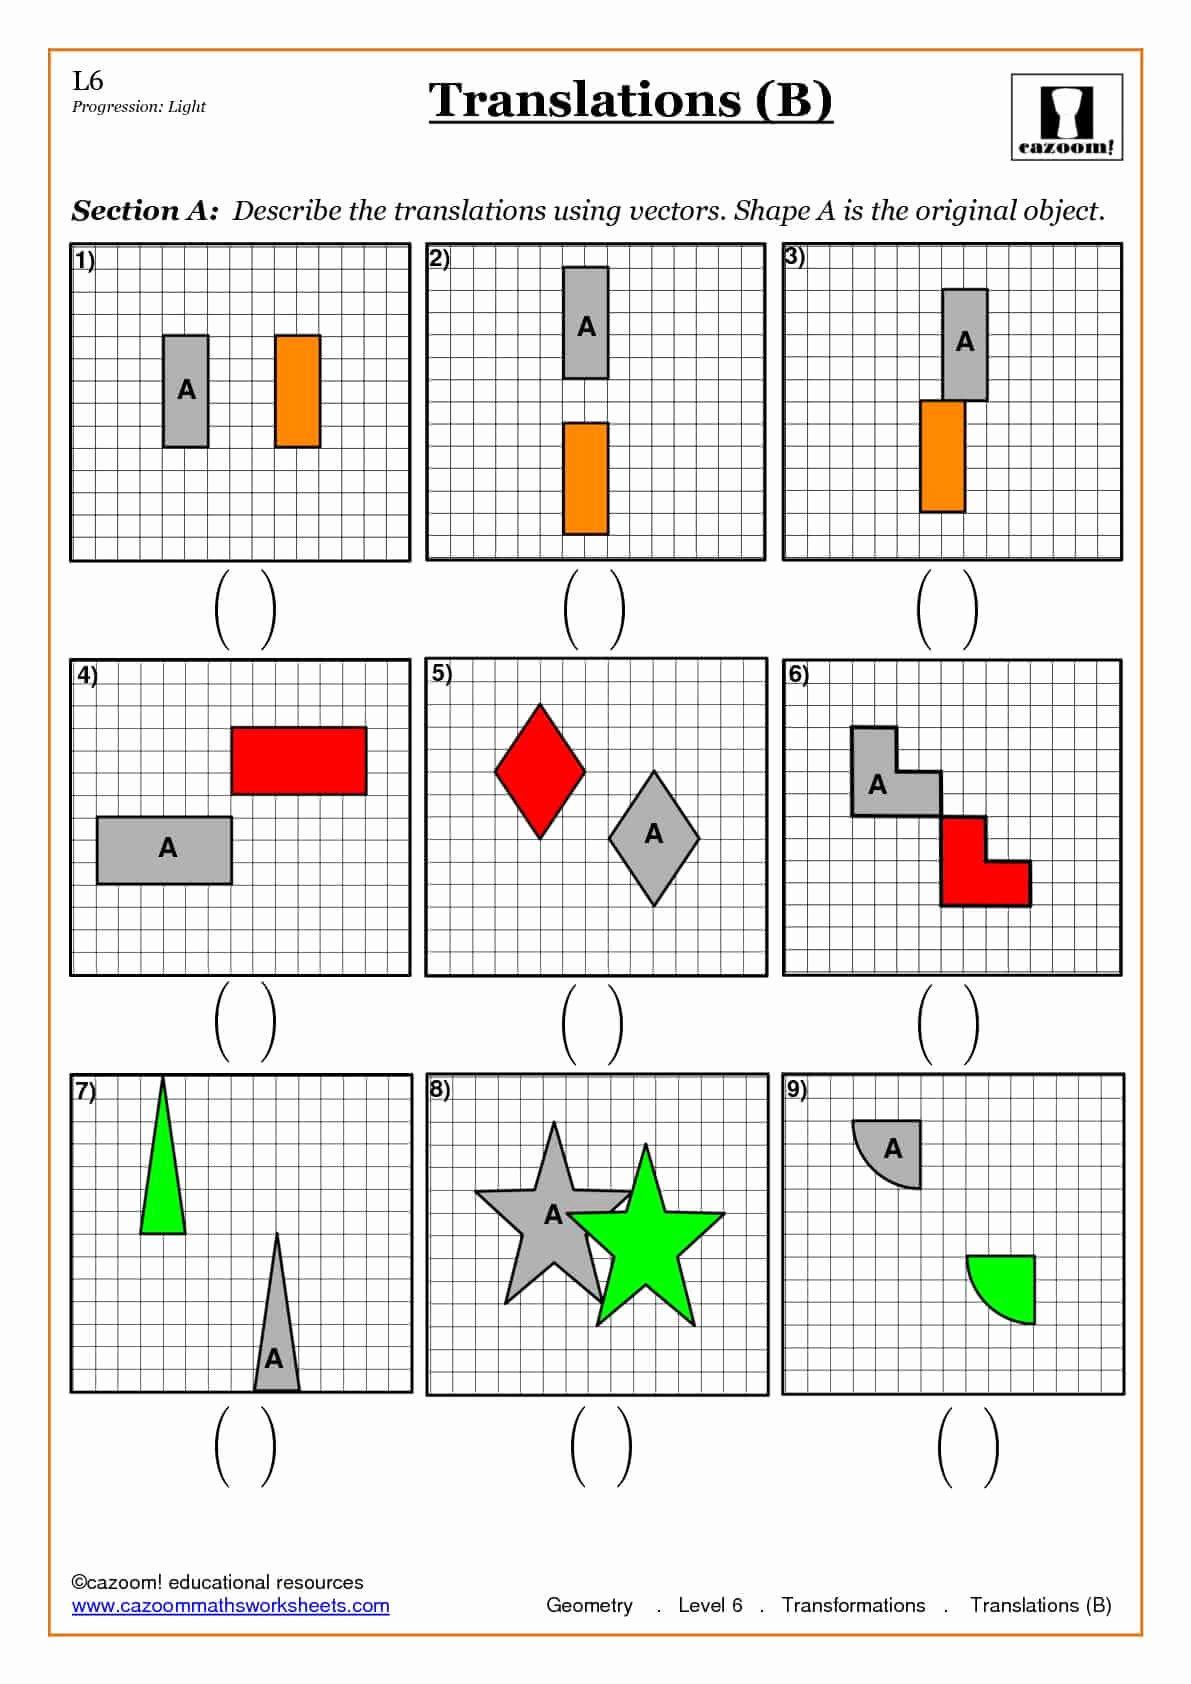 Geometry Transformations Worksheet Pdf Unique Trigonometry and Pythagoras Worksheets